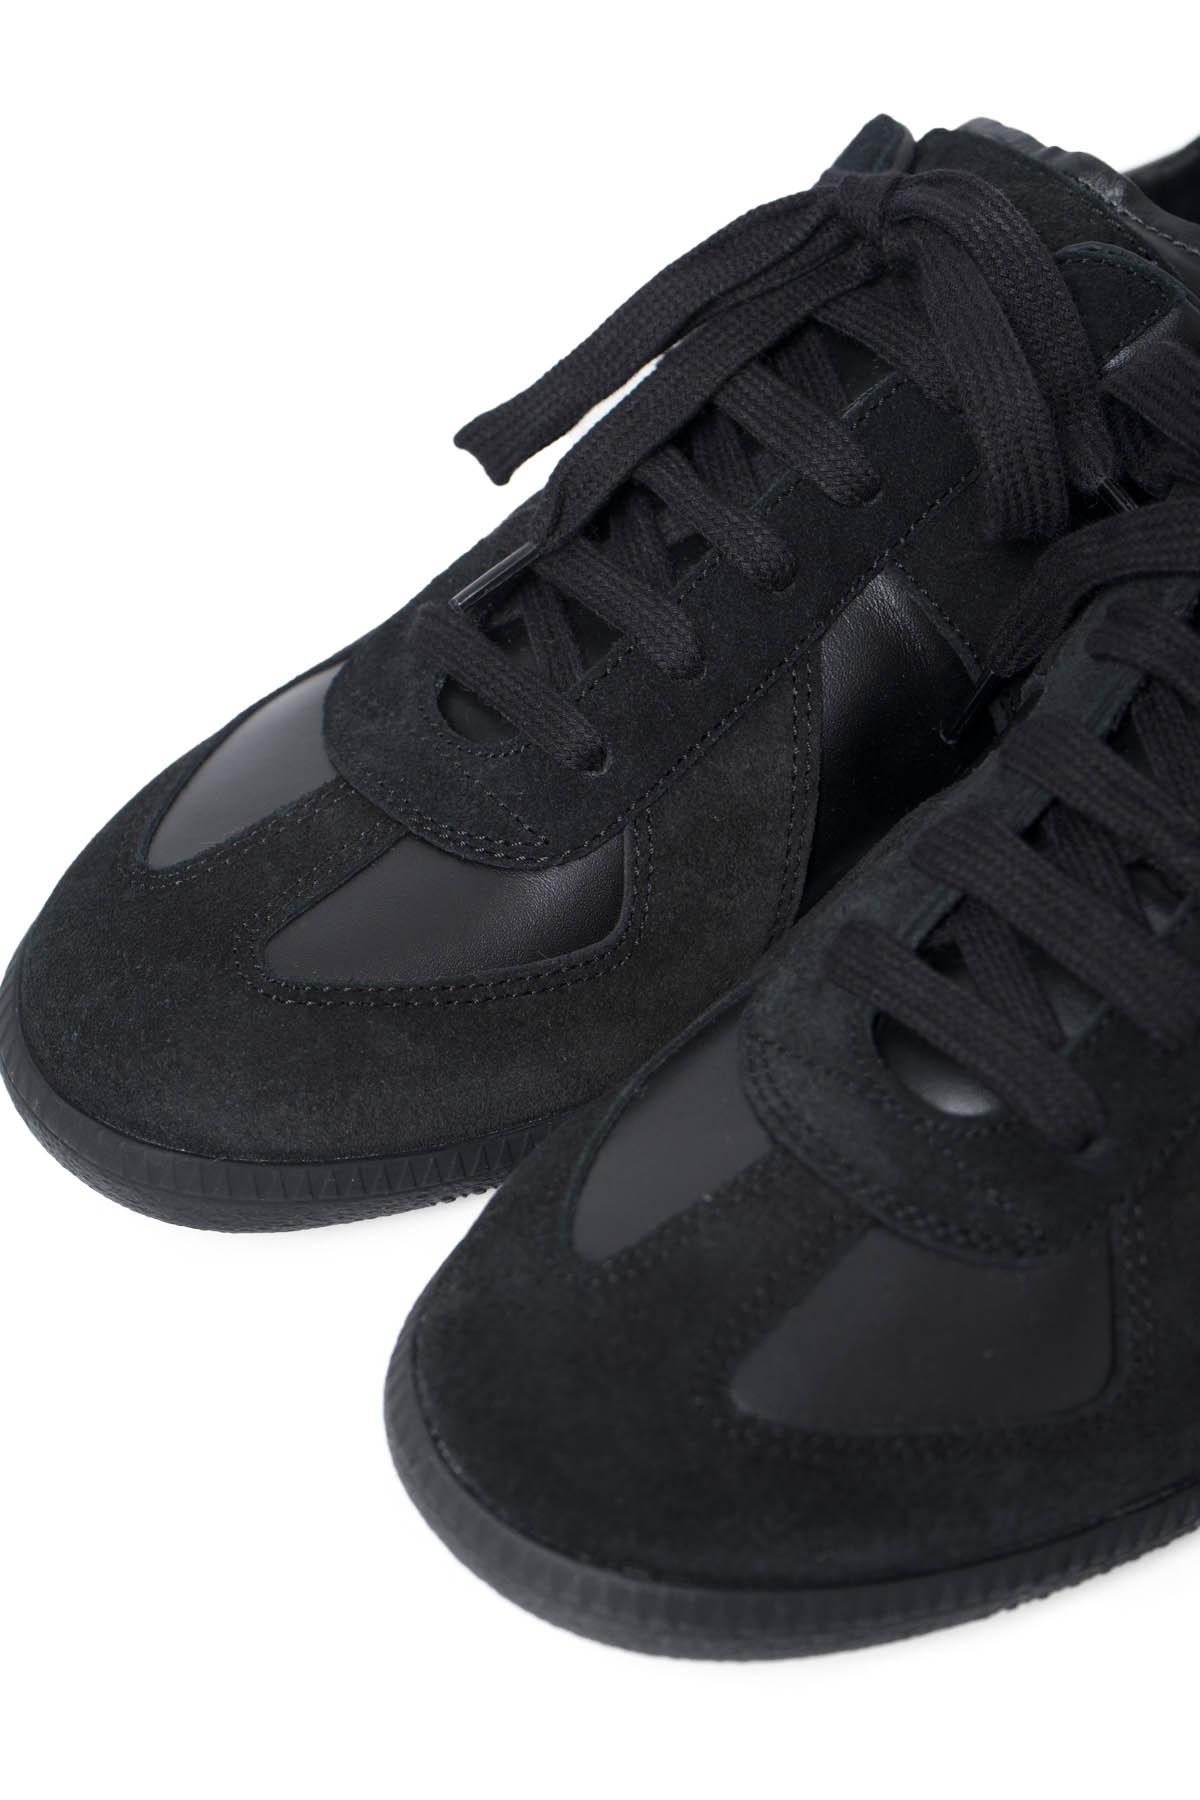 German Trainer All Black[2021SS]